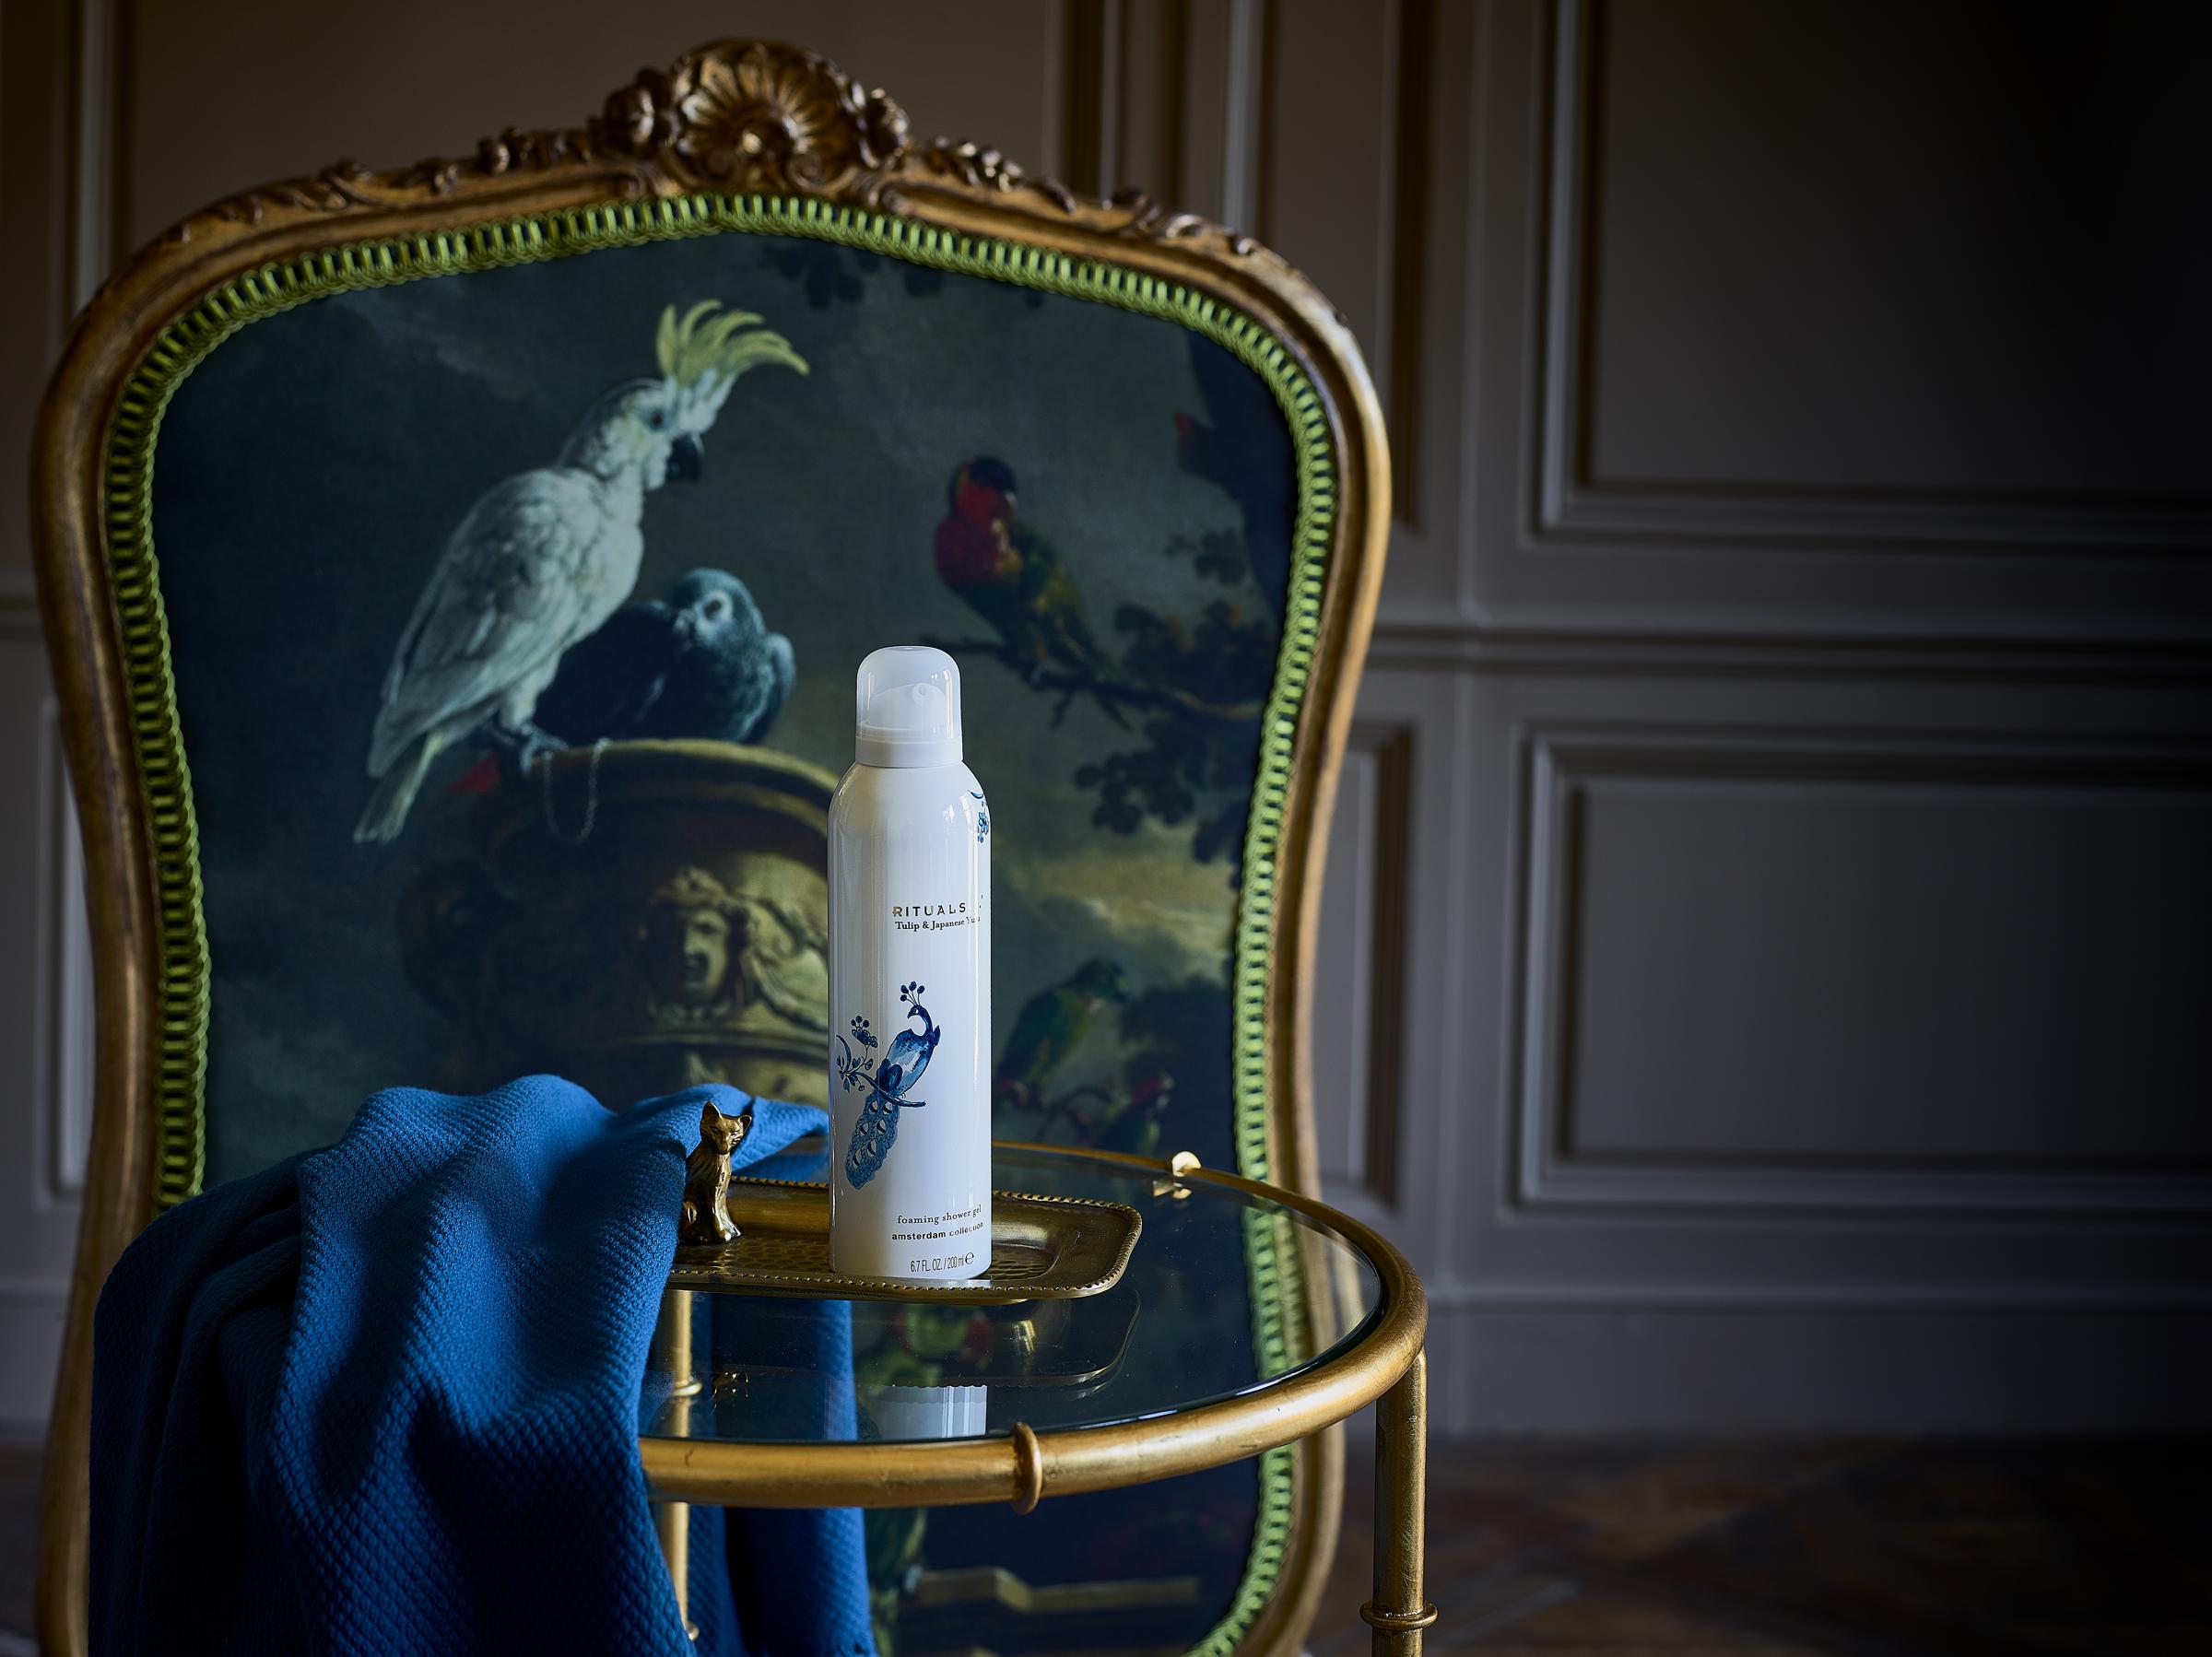 jeroen-van-der-spek-Stillife-photography-cleo-scheulderman-RITUALS Rijksmuseum Amsterdamrituasls_ams_coll_84318.jpg